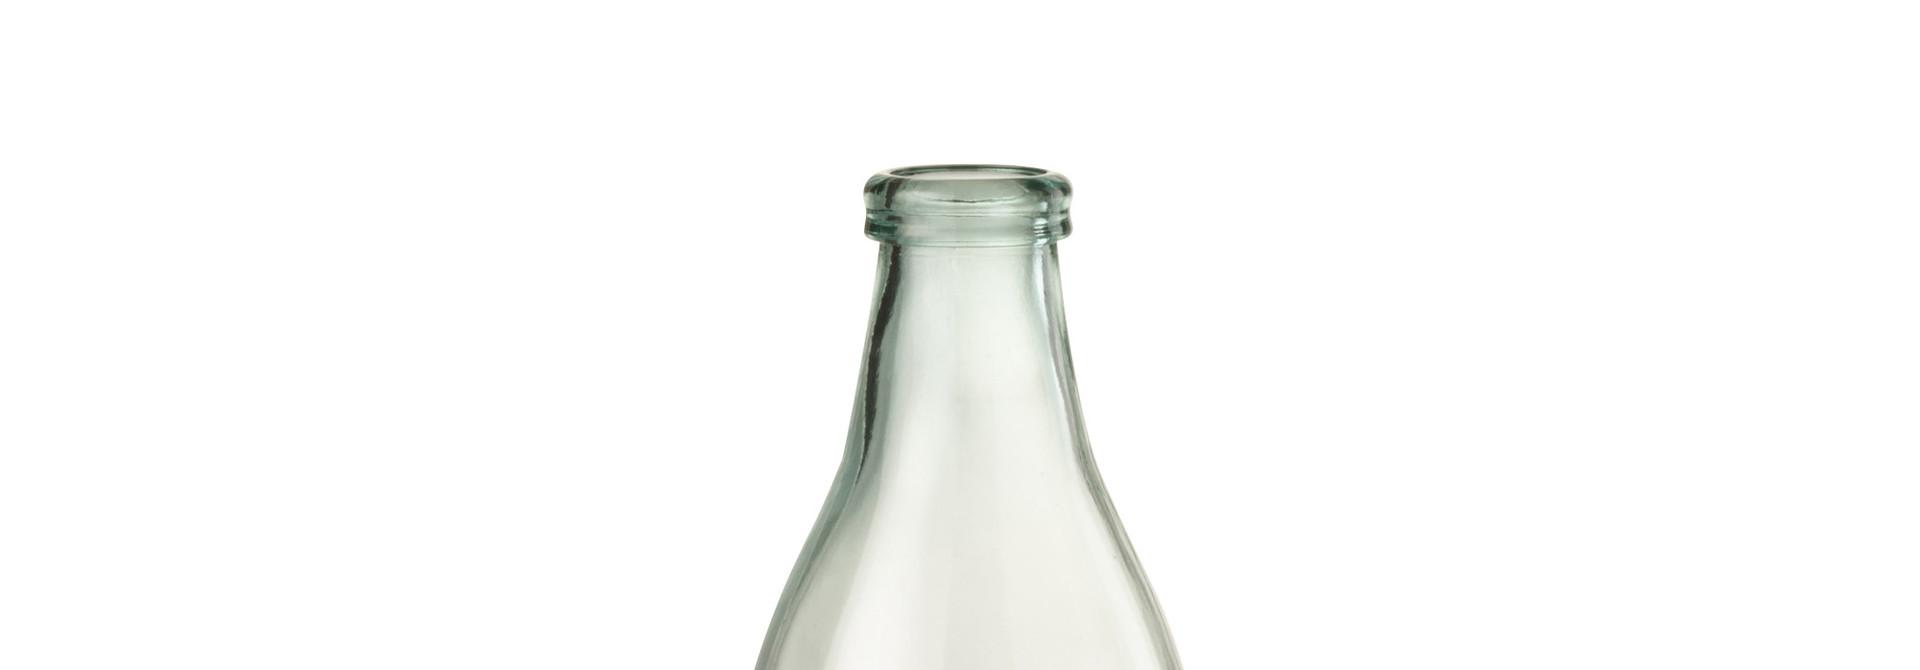 Vaas Fles Glas Transparant